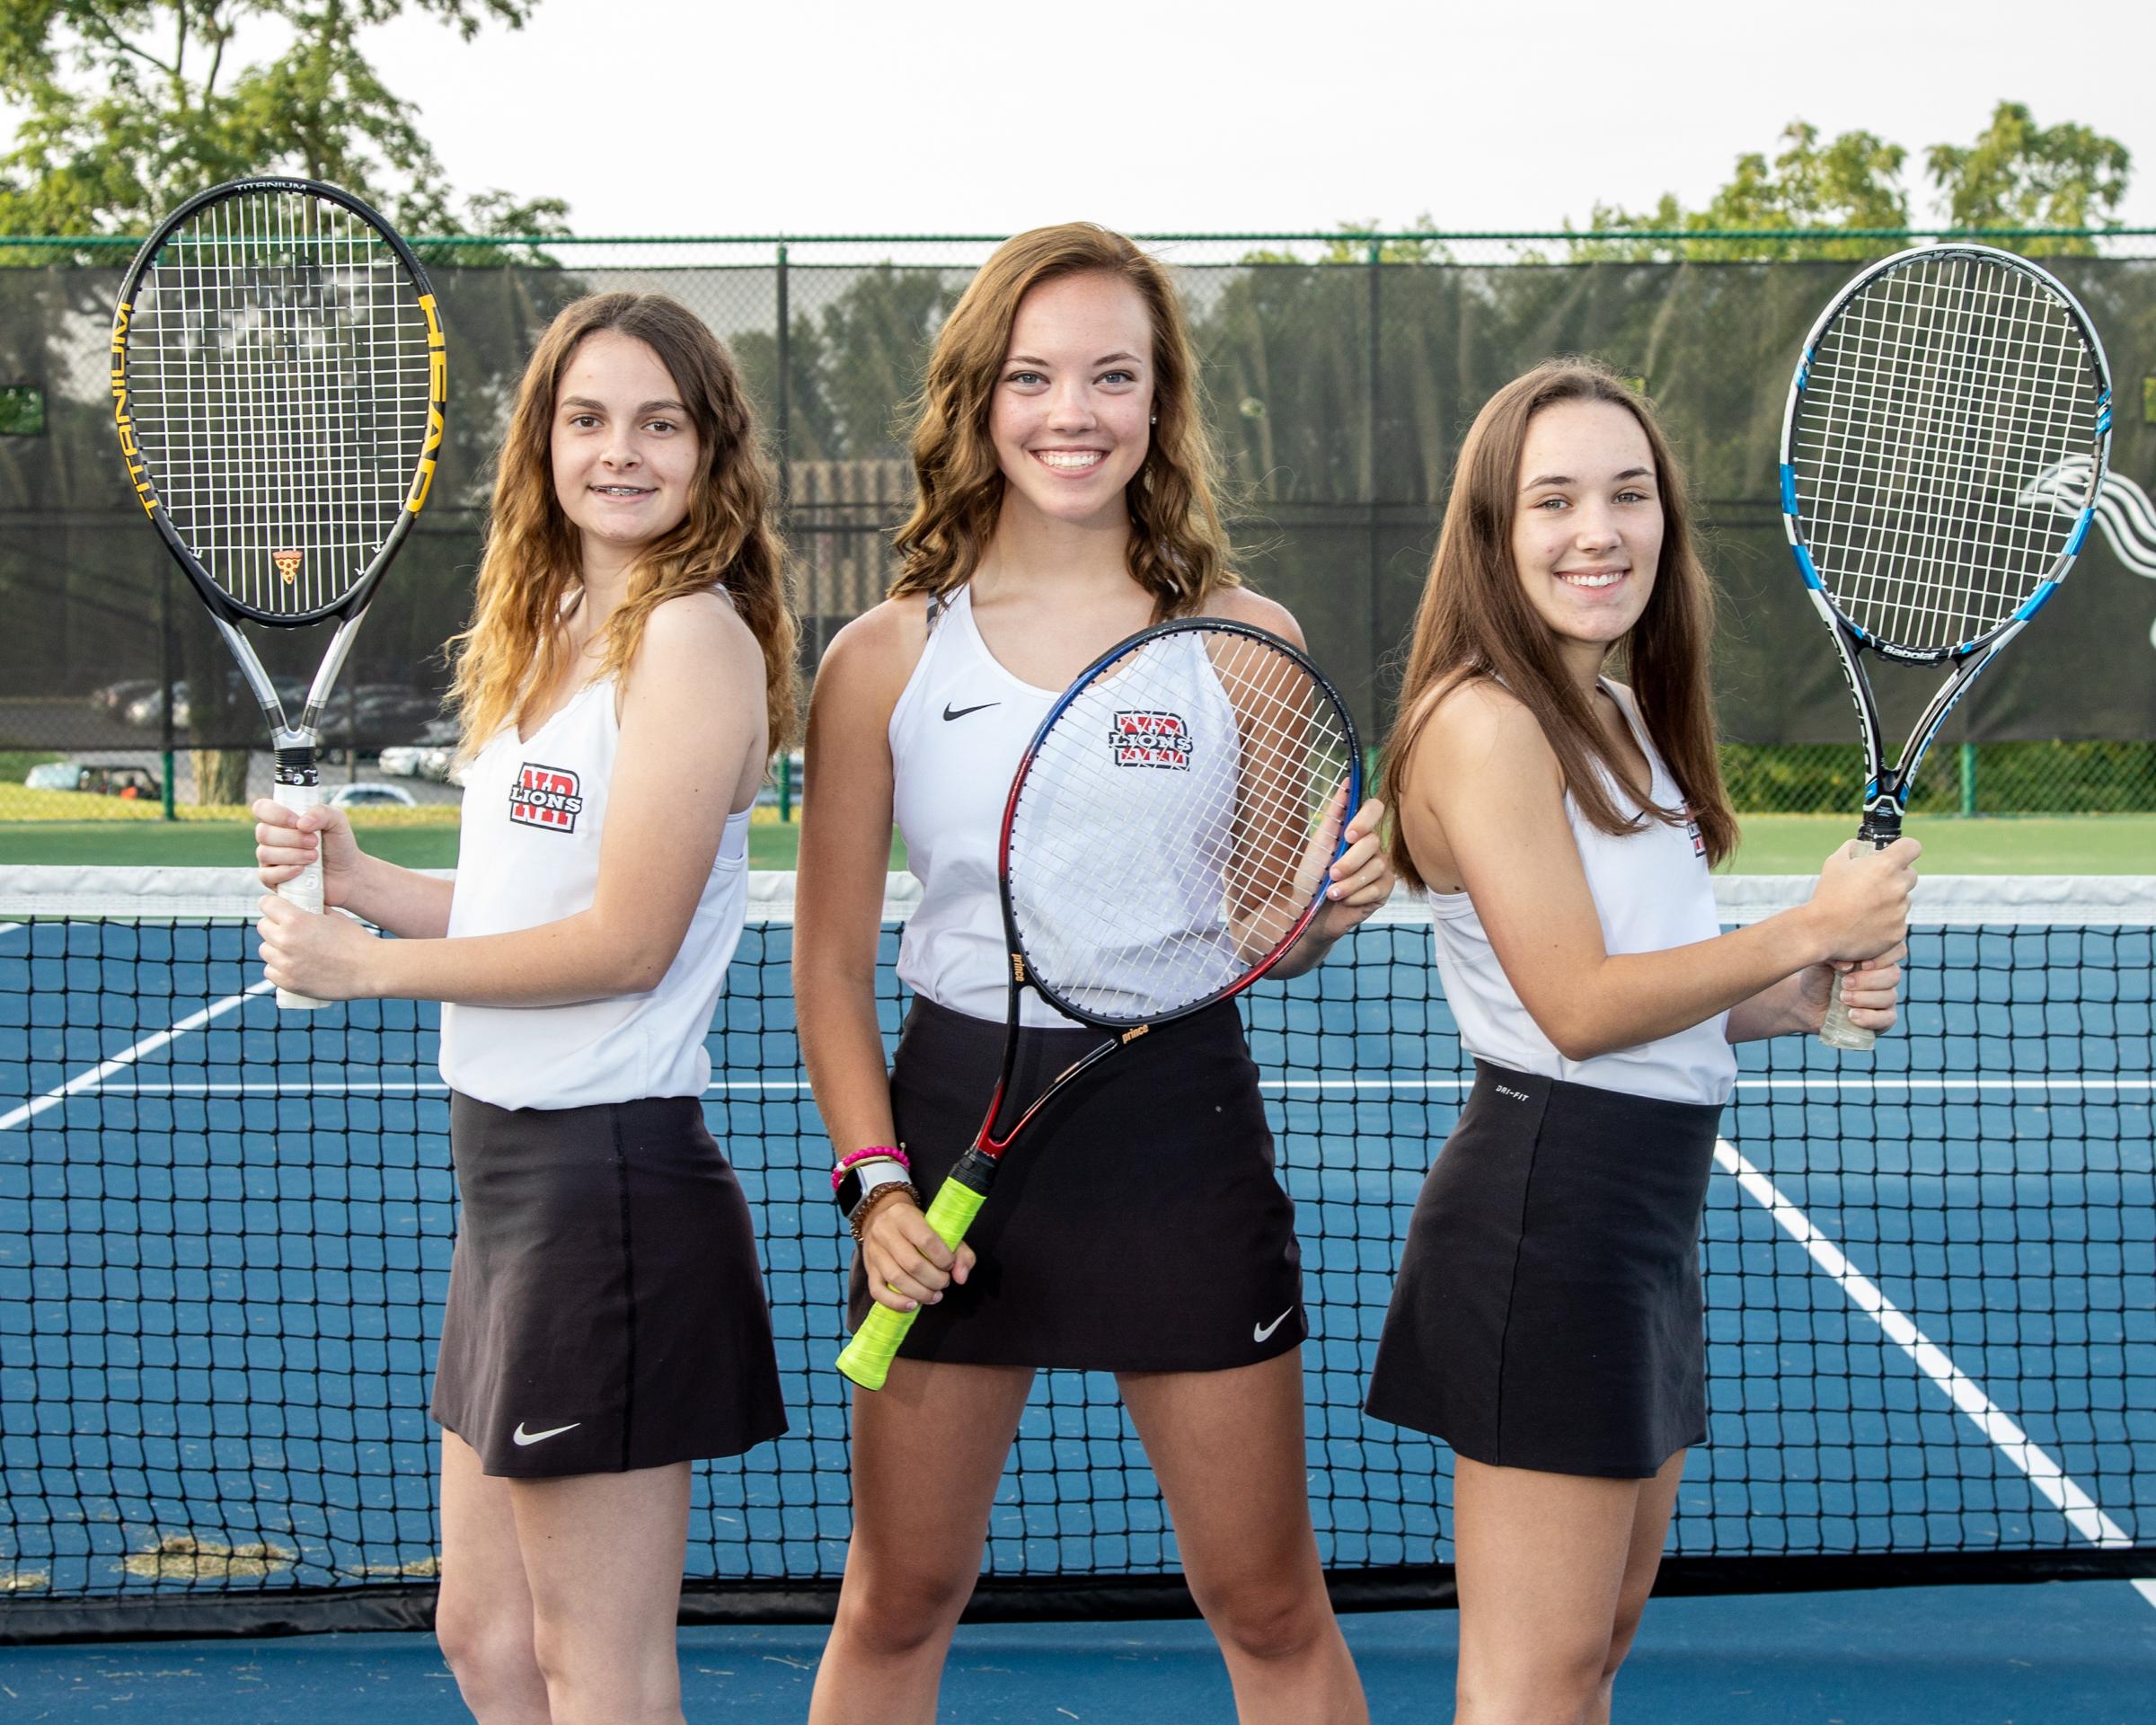 2021 senior girls tennis players